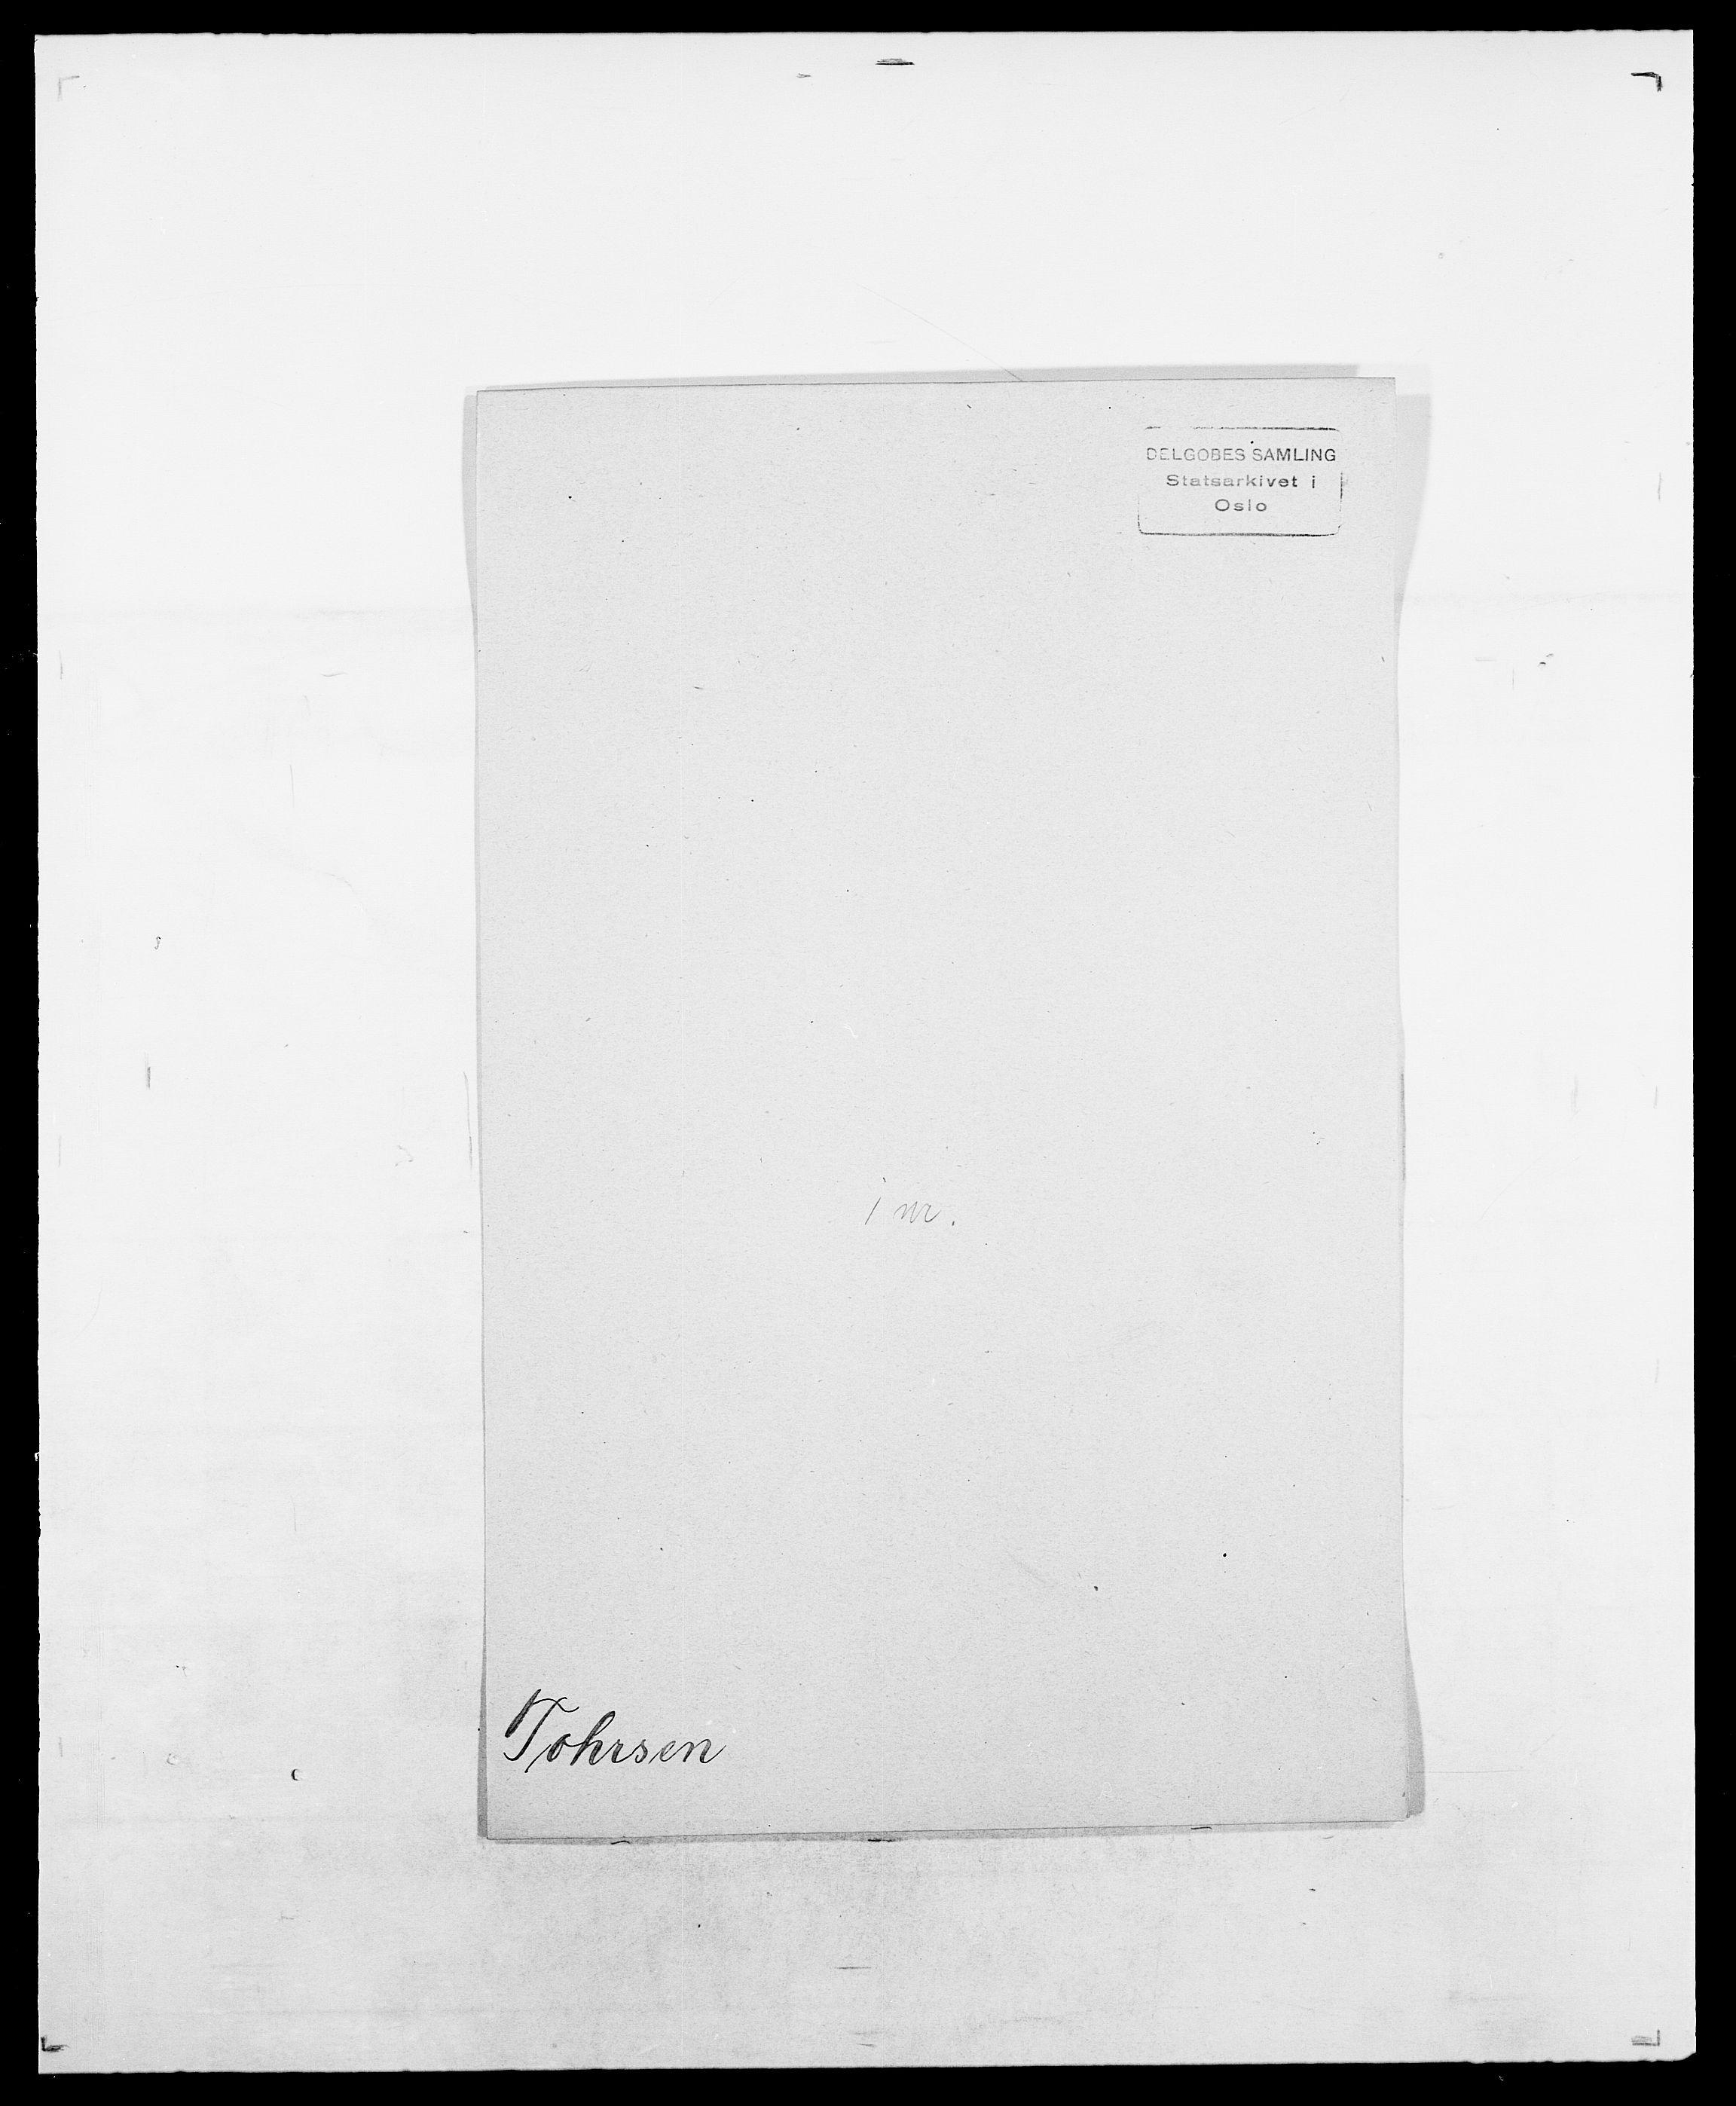 SAO, Delgobe, Charles Antoine - samling, D/Da/L0039: Thorsen - Urup, s. 114